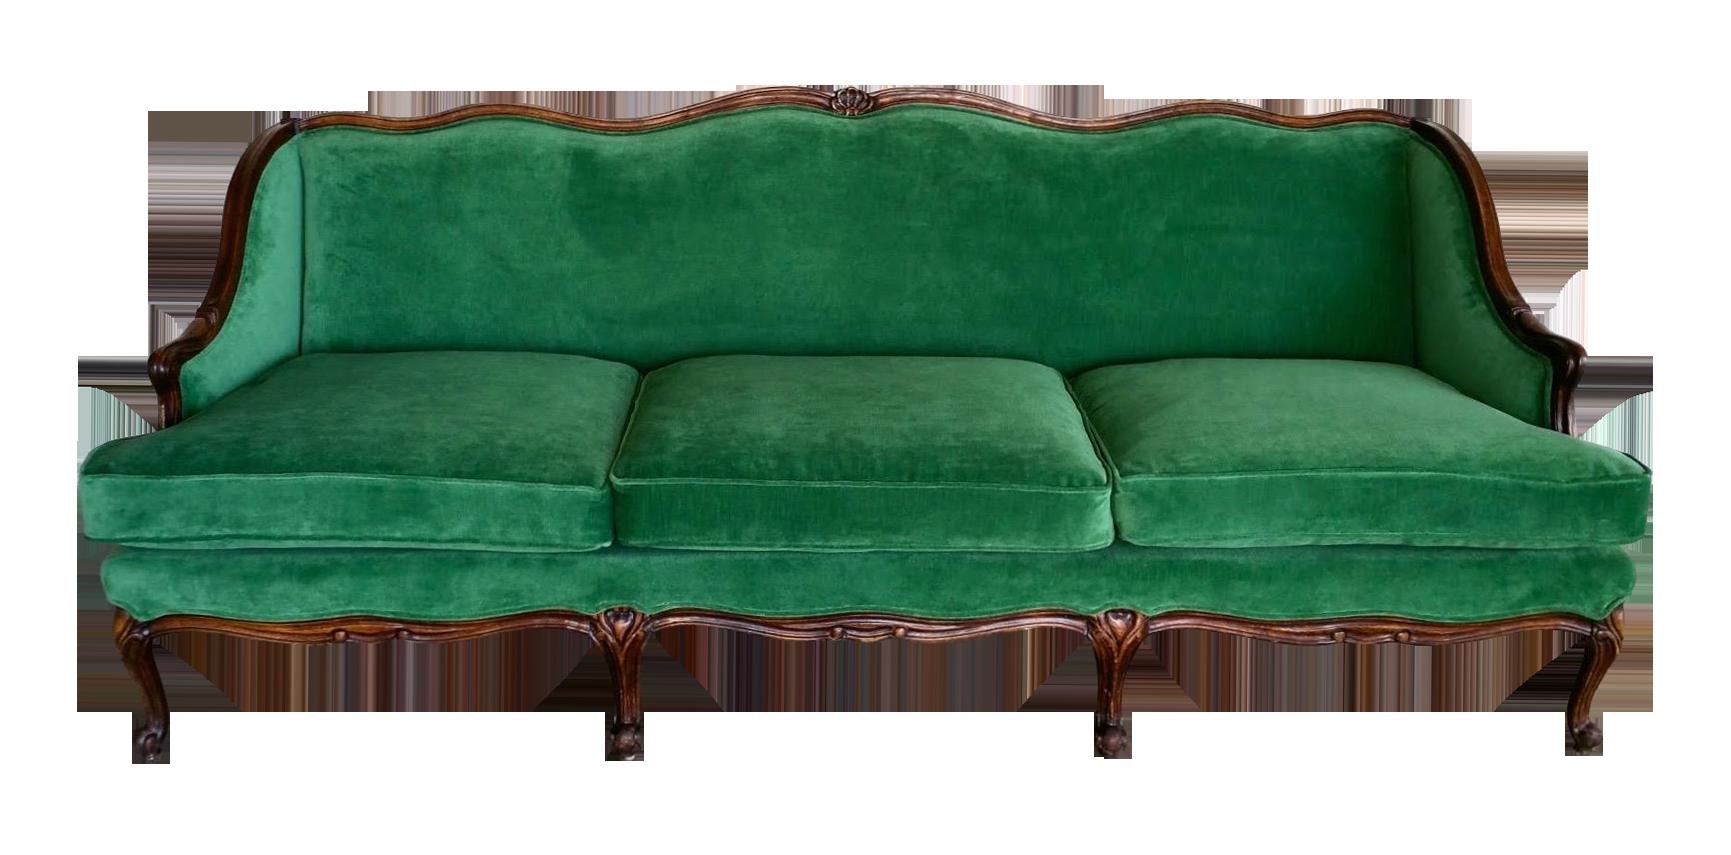 emerald green sofa covers sleeper costco vintage velvet on chairish